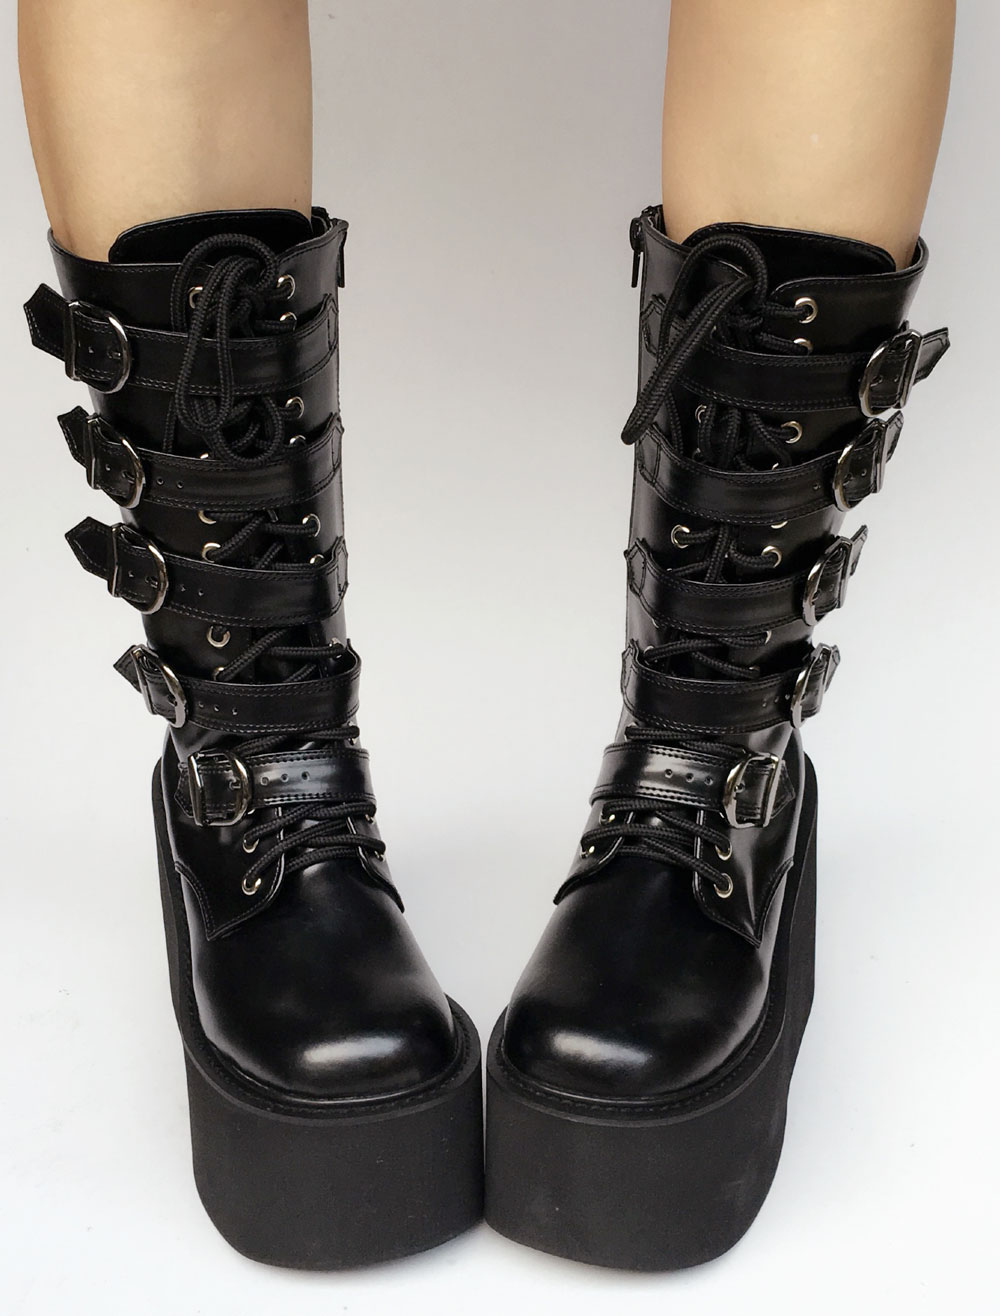 Lolita Platform Boots Black Wedge Buckle Lace Up Round Toe Lolita Short Boots